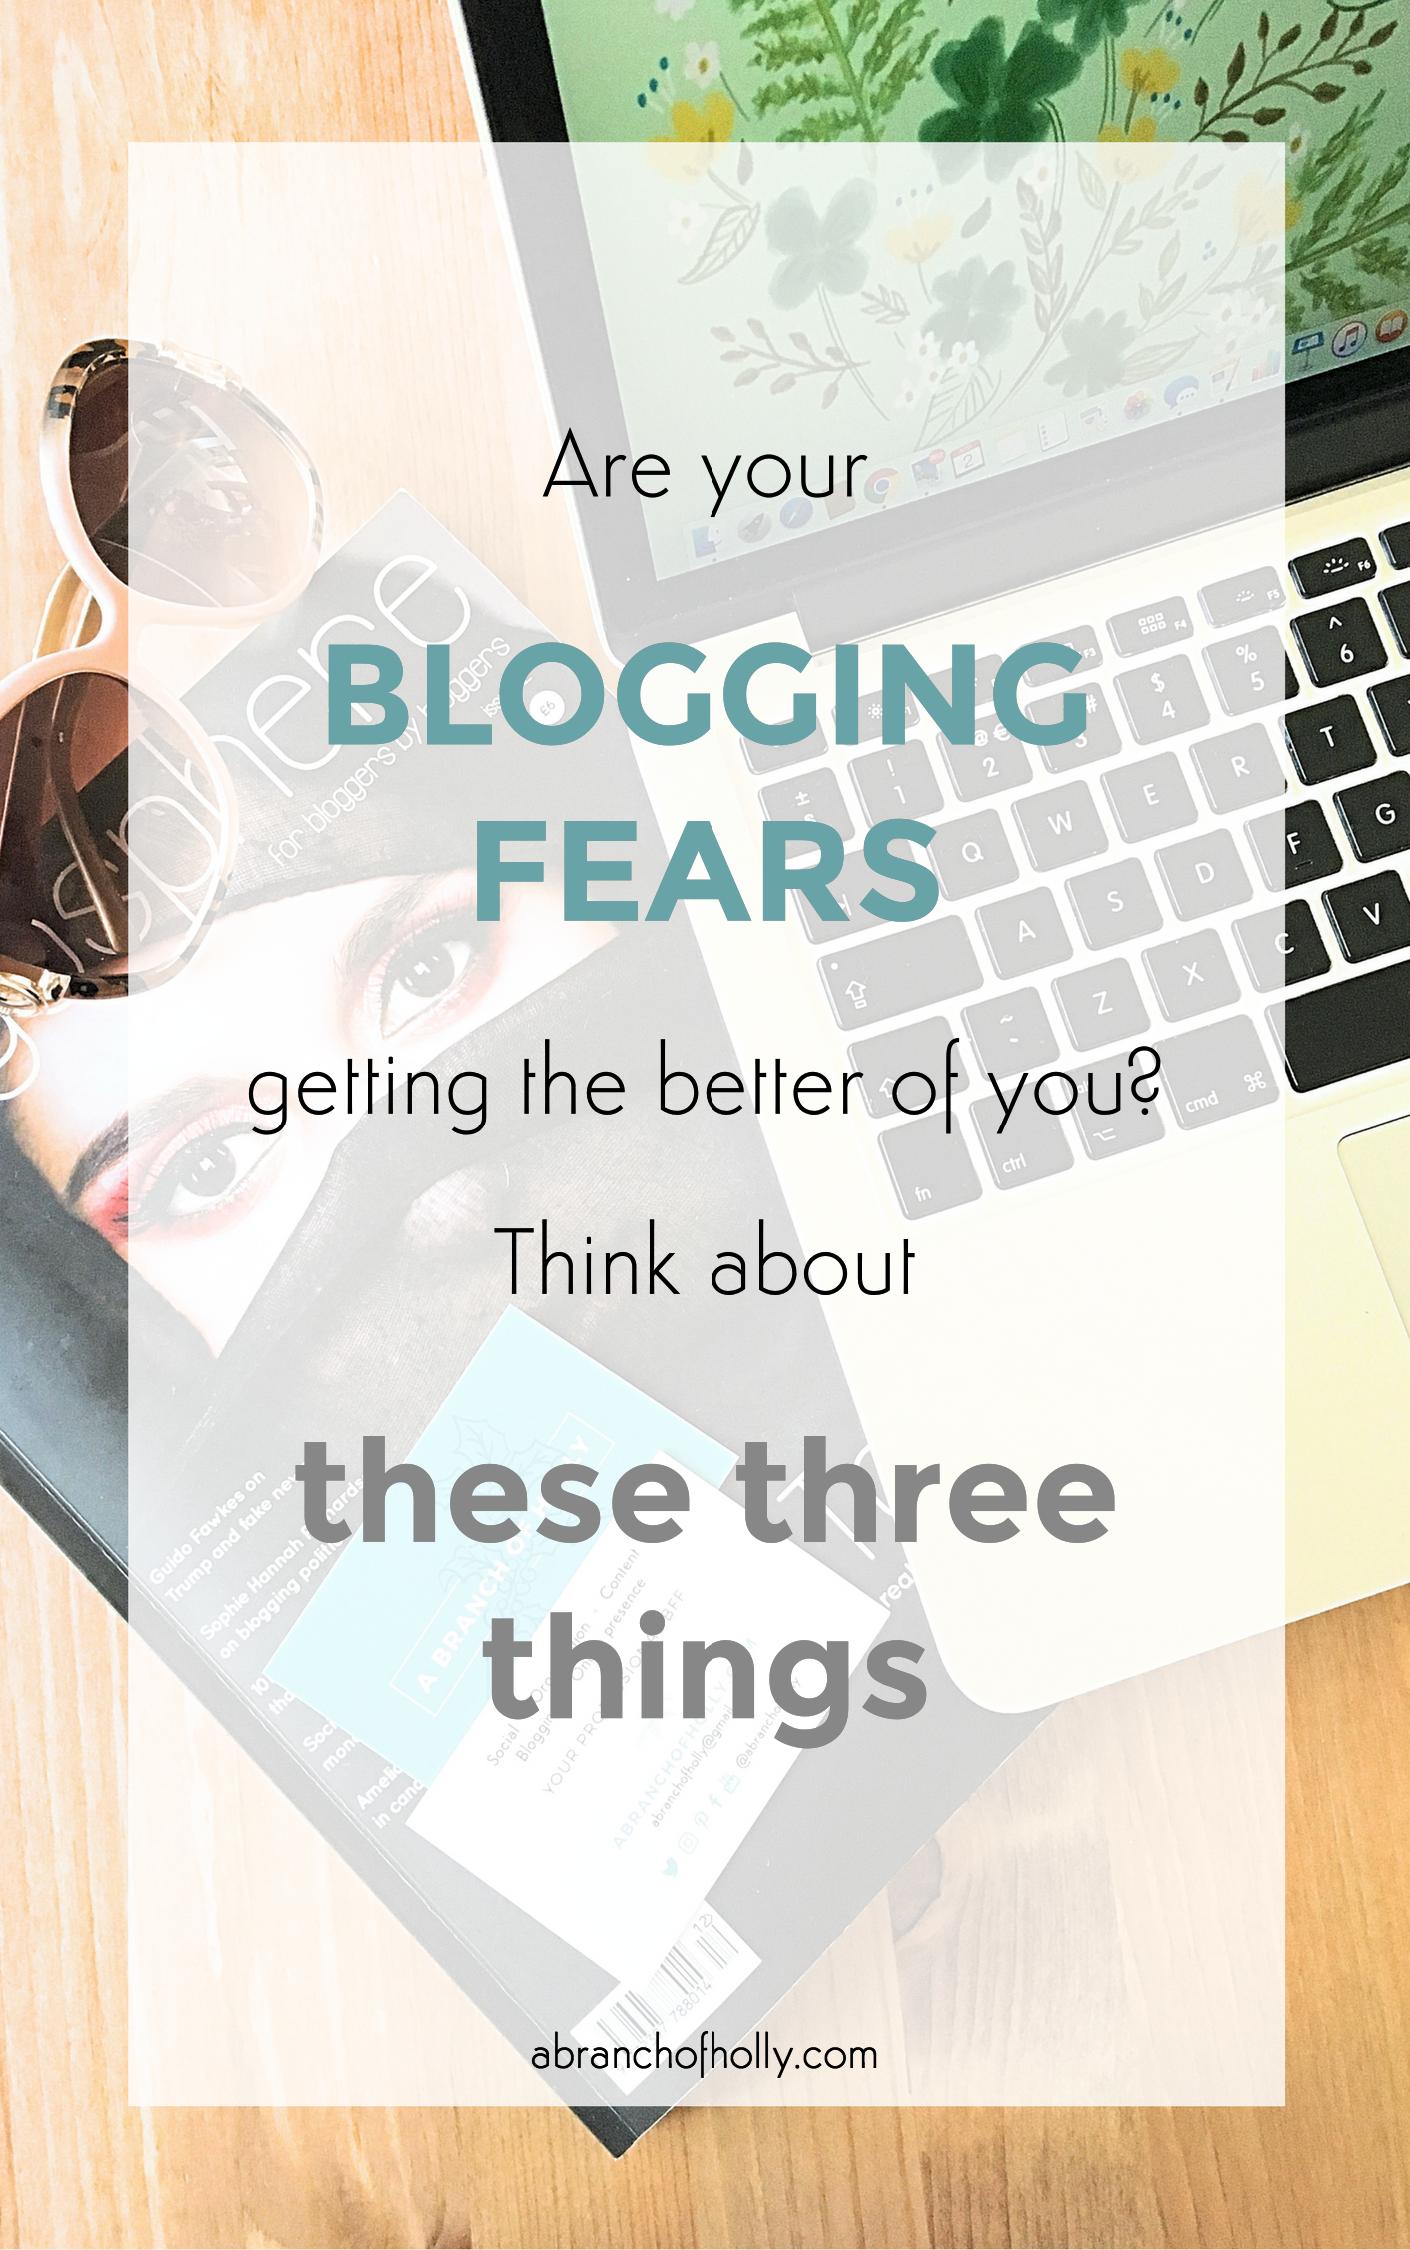 conquer blogging fears